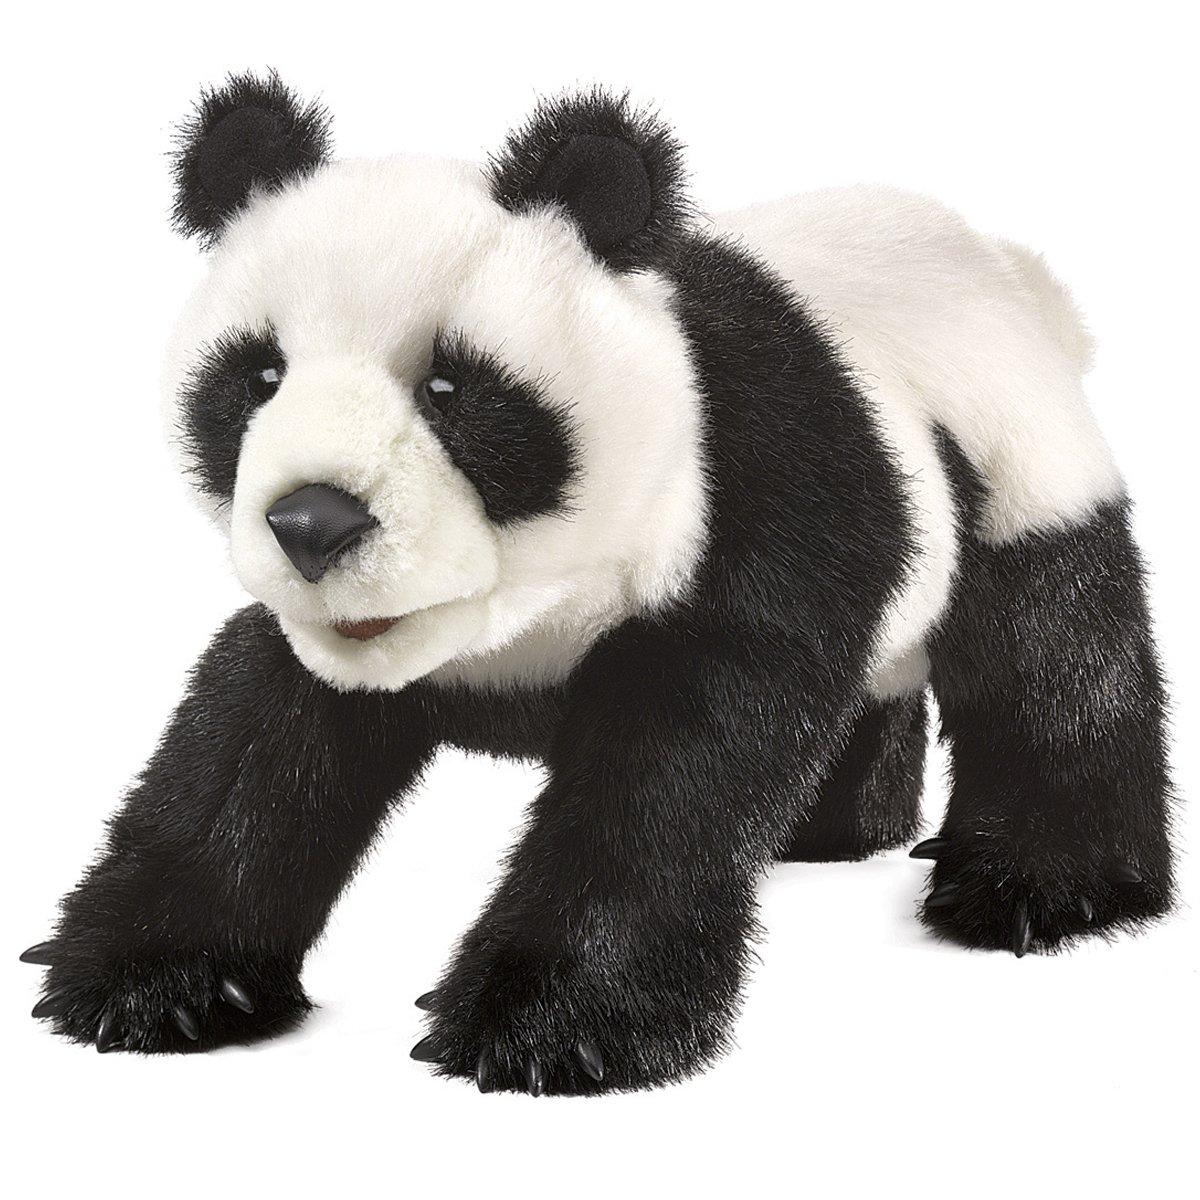 Folkmanis Puppets Small Panda Bear Hand Puppet, Black White